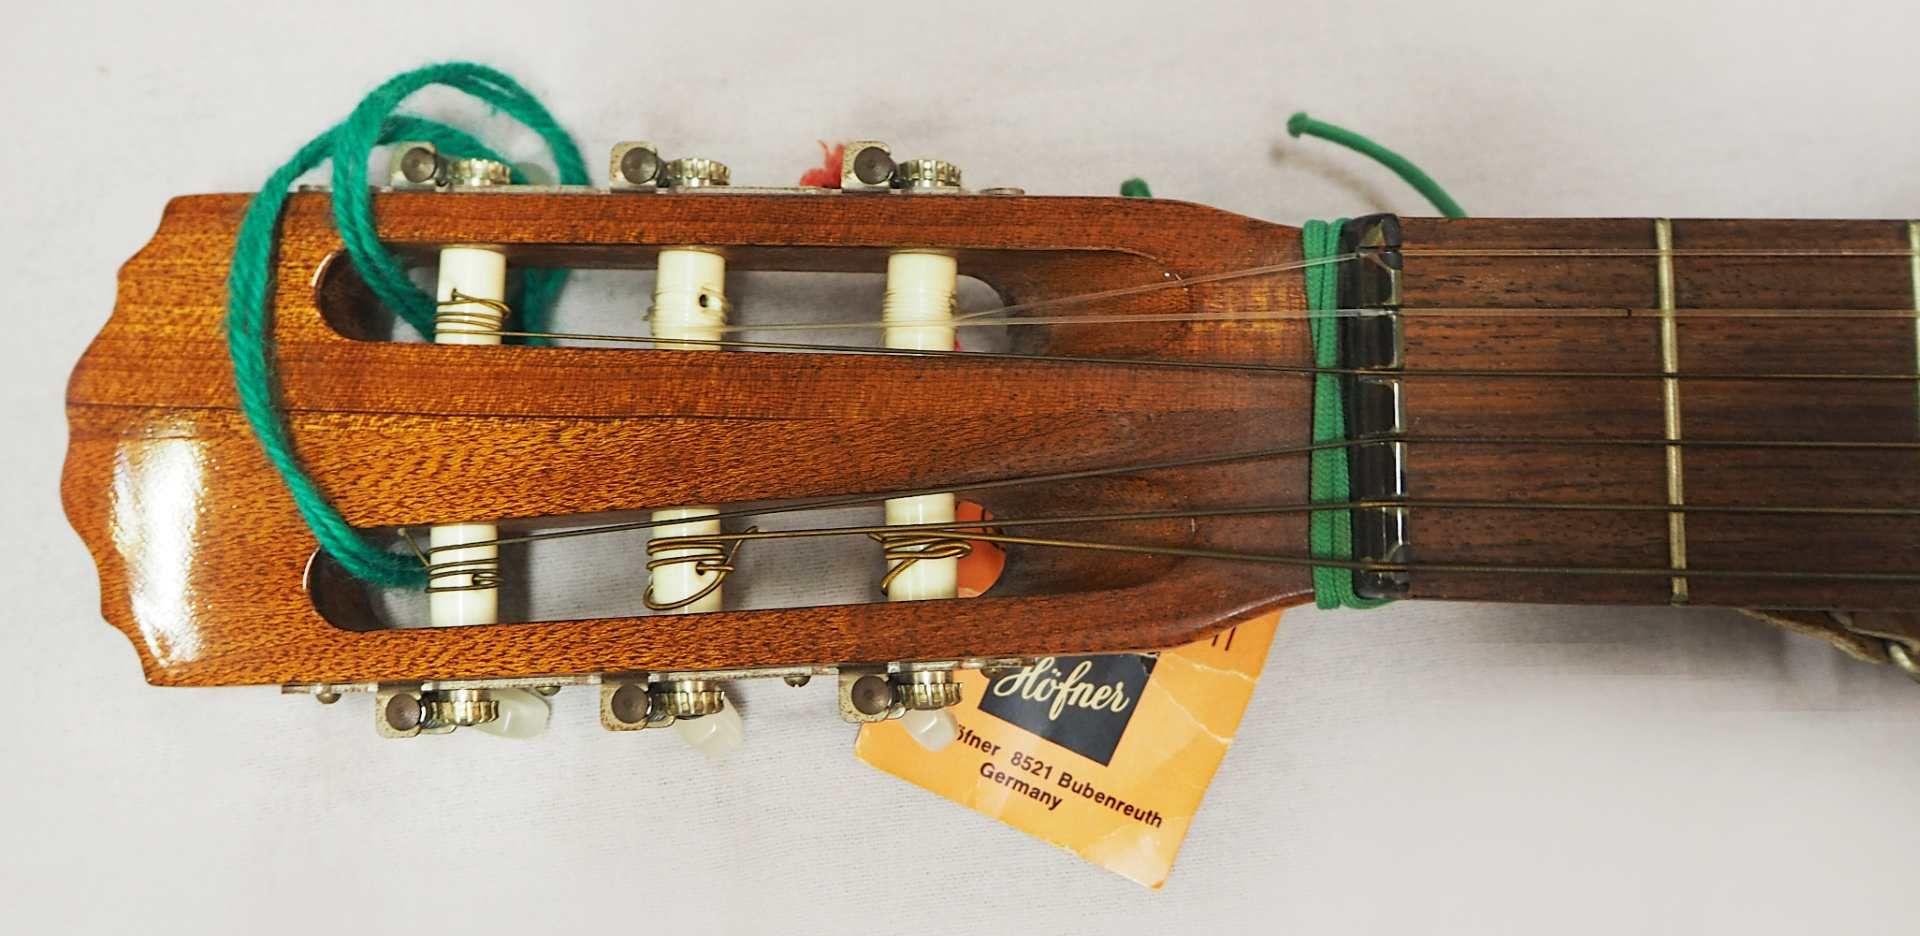 1 Konzert-Gitarre HÖFNER Modellnummer: 4840, wohl z.T. Rosenholz min. intarsiert auf - Bild 6 aus 8